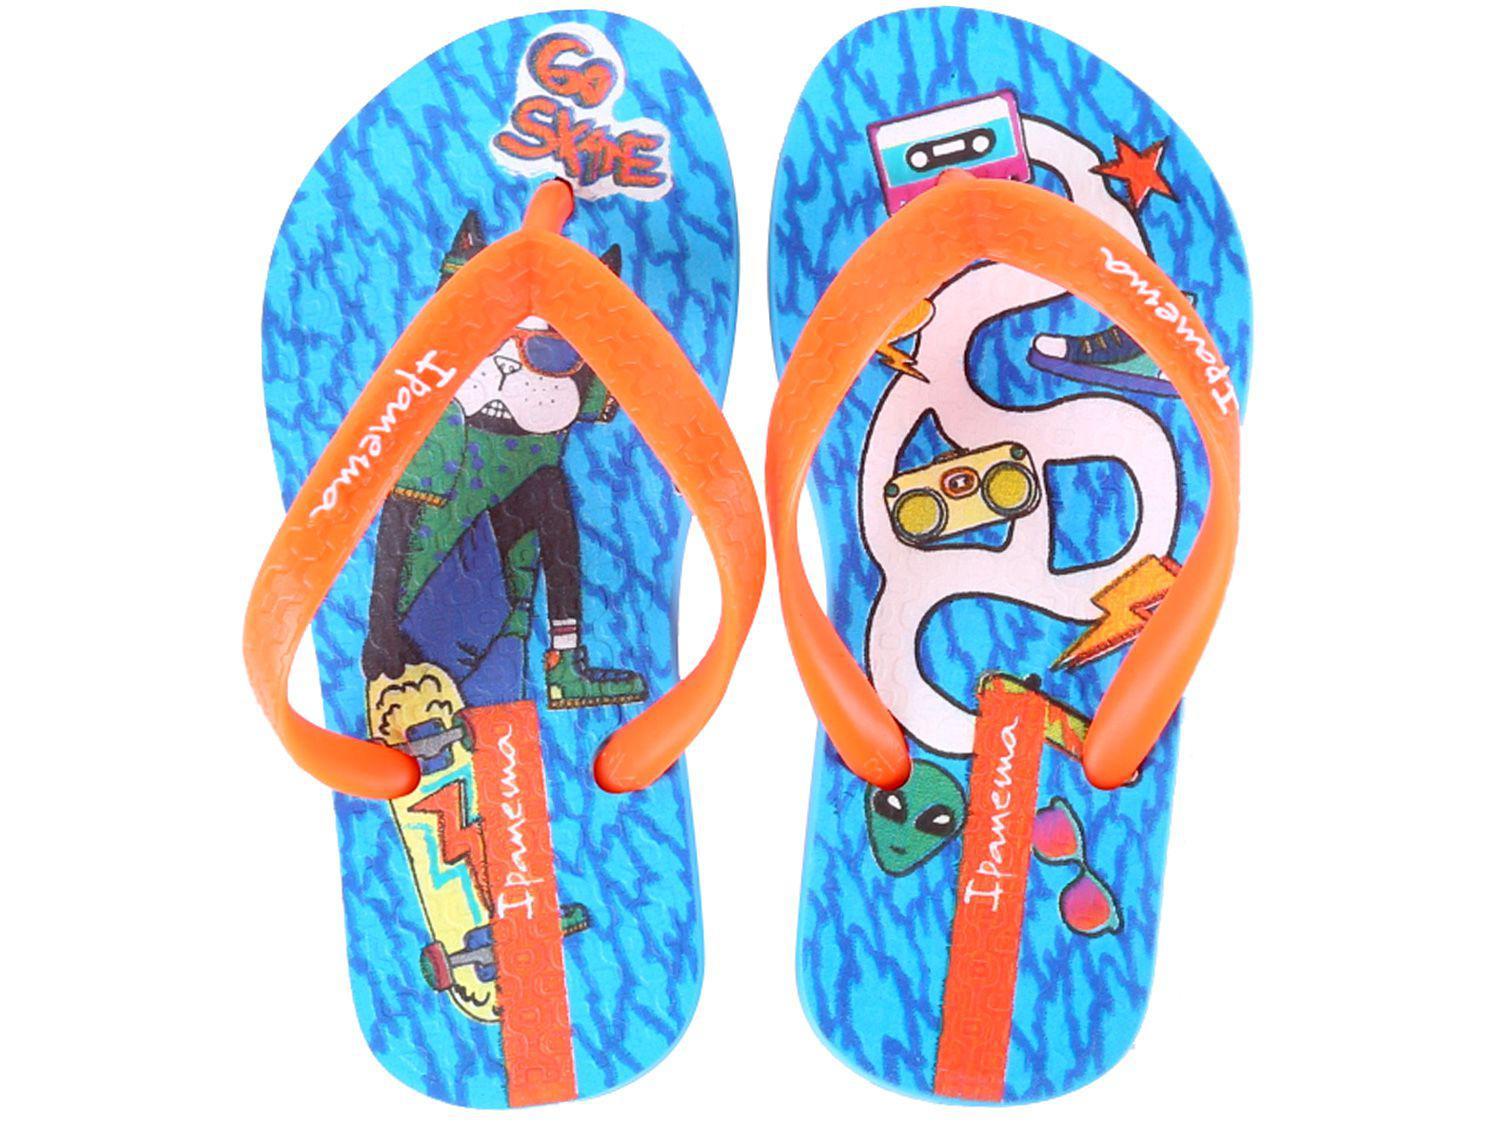 Chinelo Infantil Grendene Kids Ipanema - Masculino Go Skate Azul e Laranja